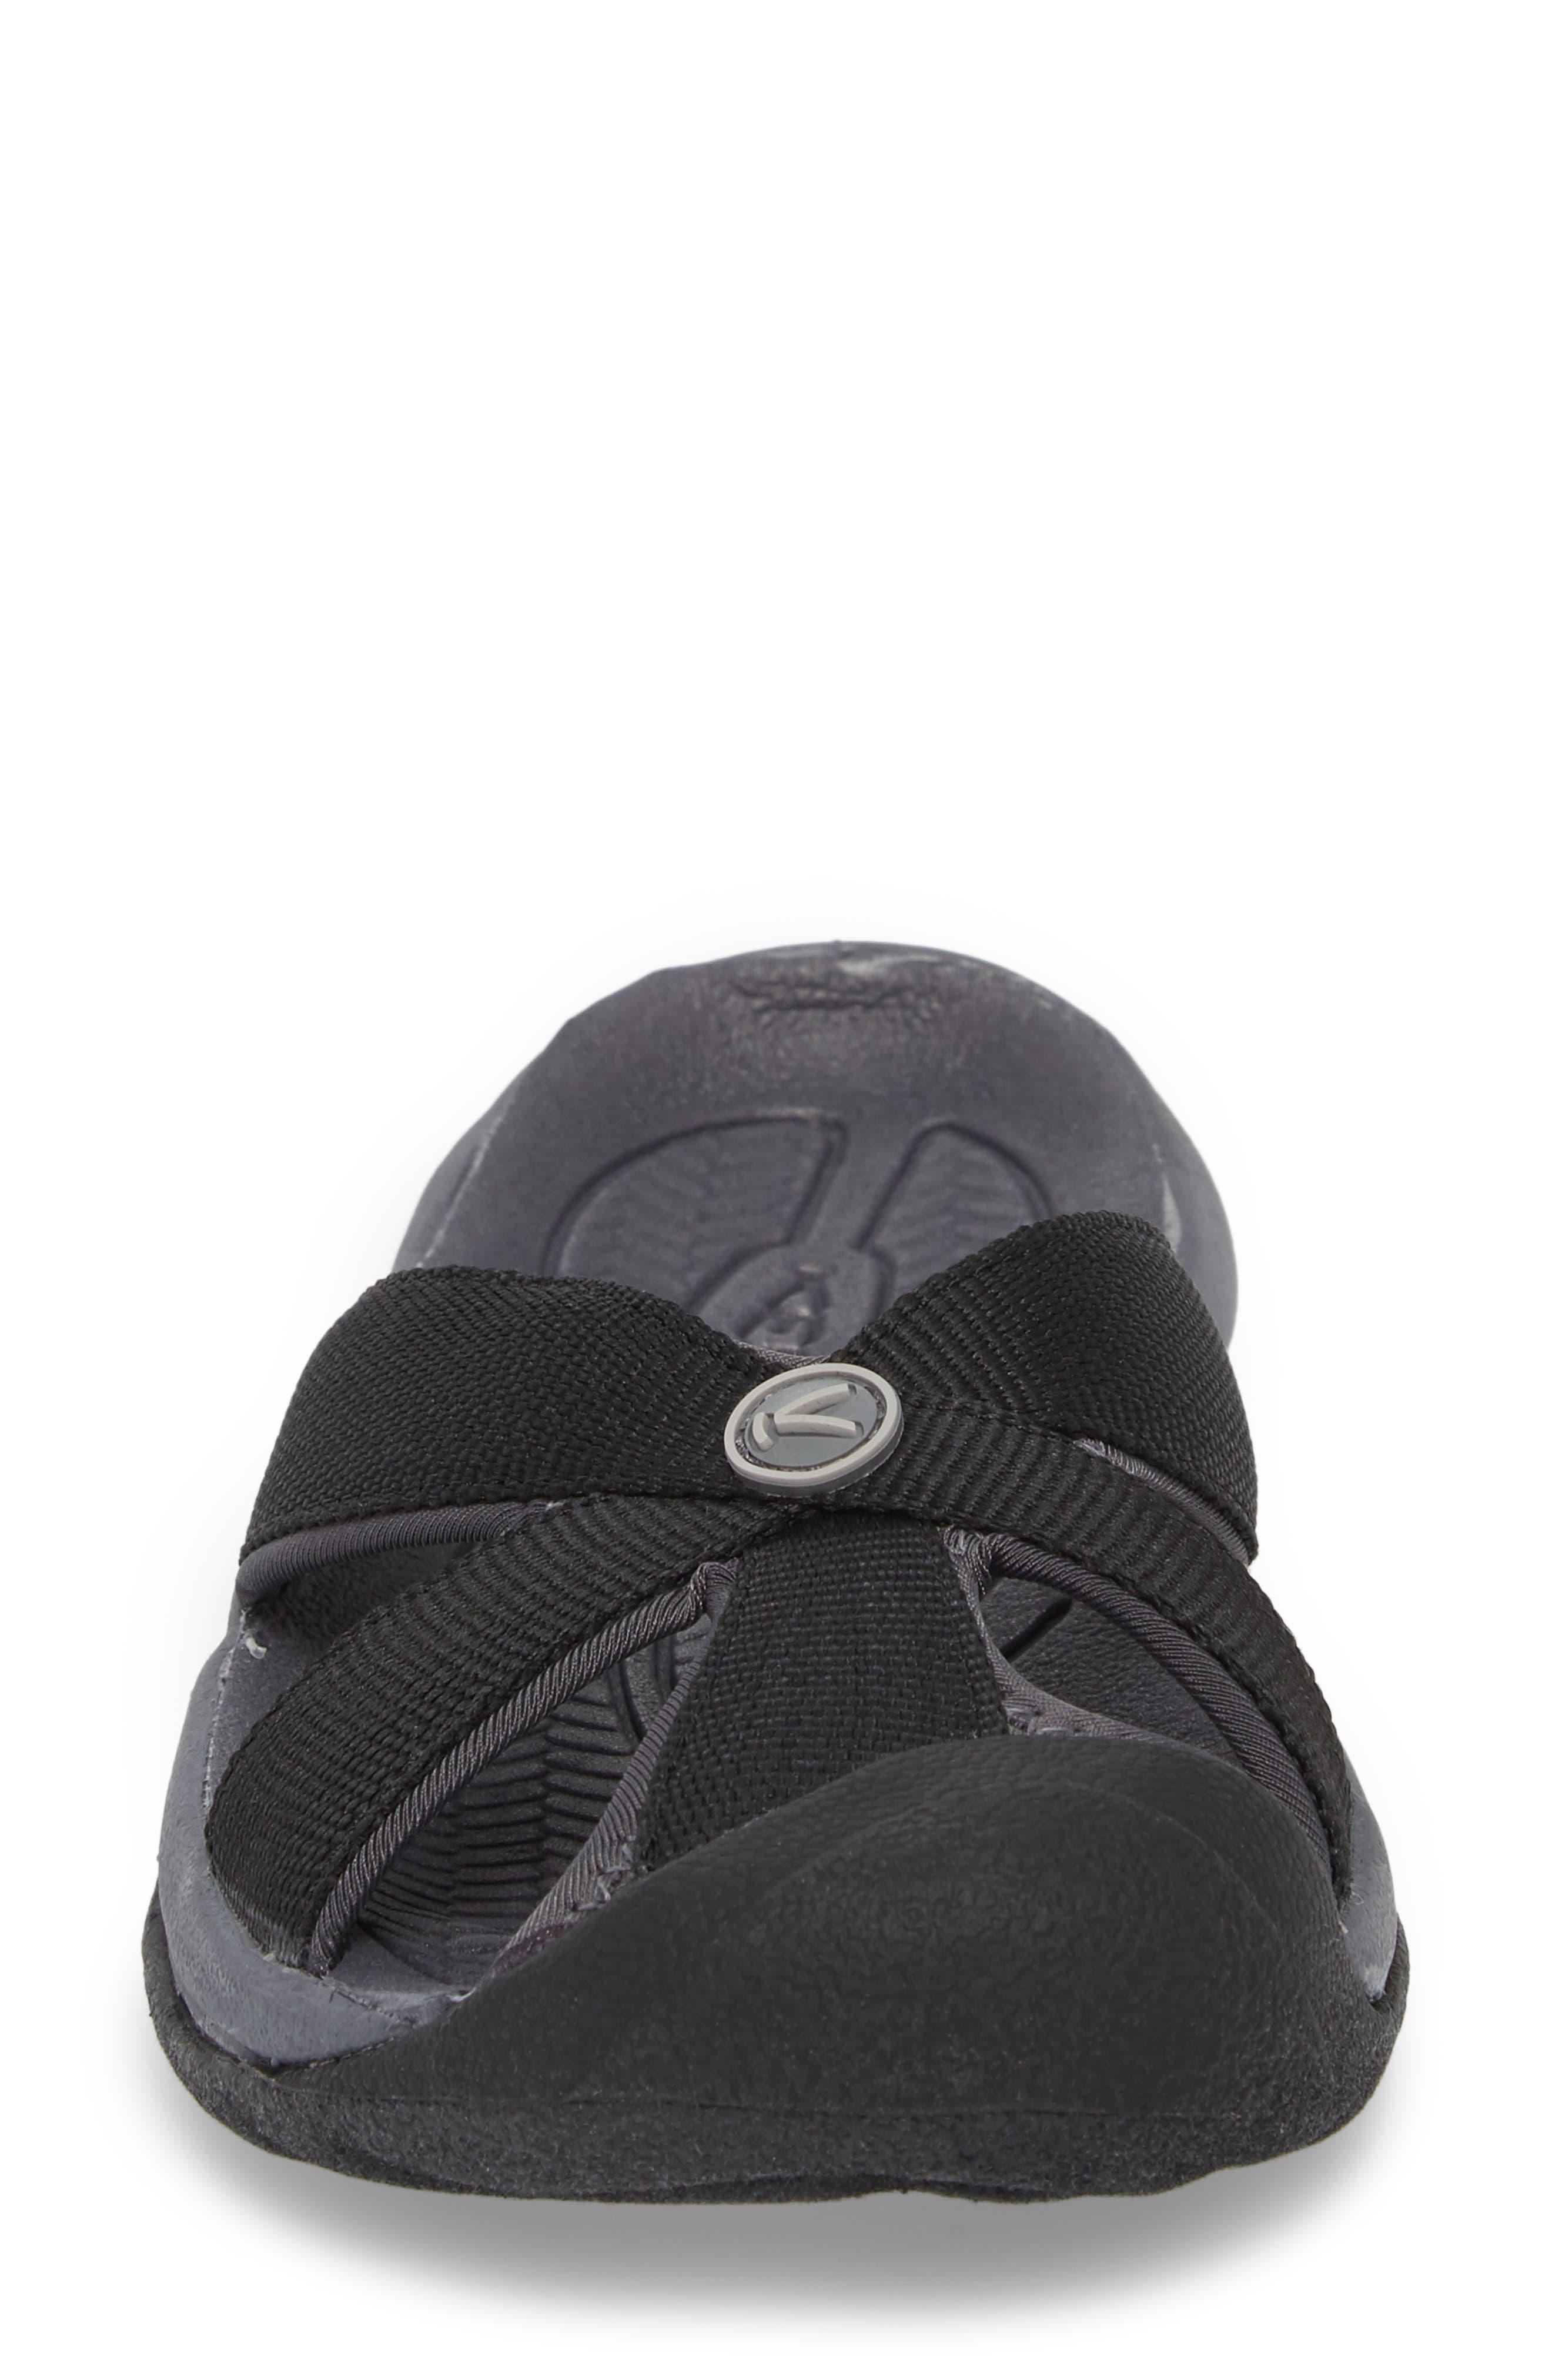 KEEN, 'Bali' Sandal, Alternate thumbnail 4, color, BLACK/ MAGNET